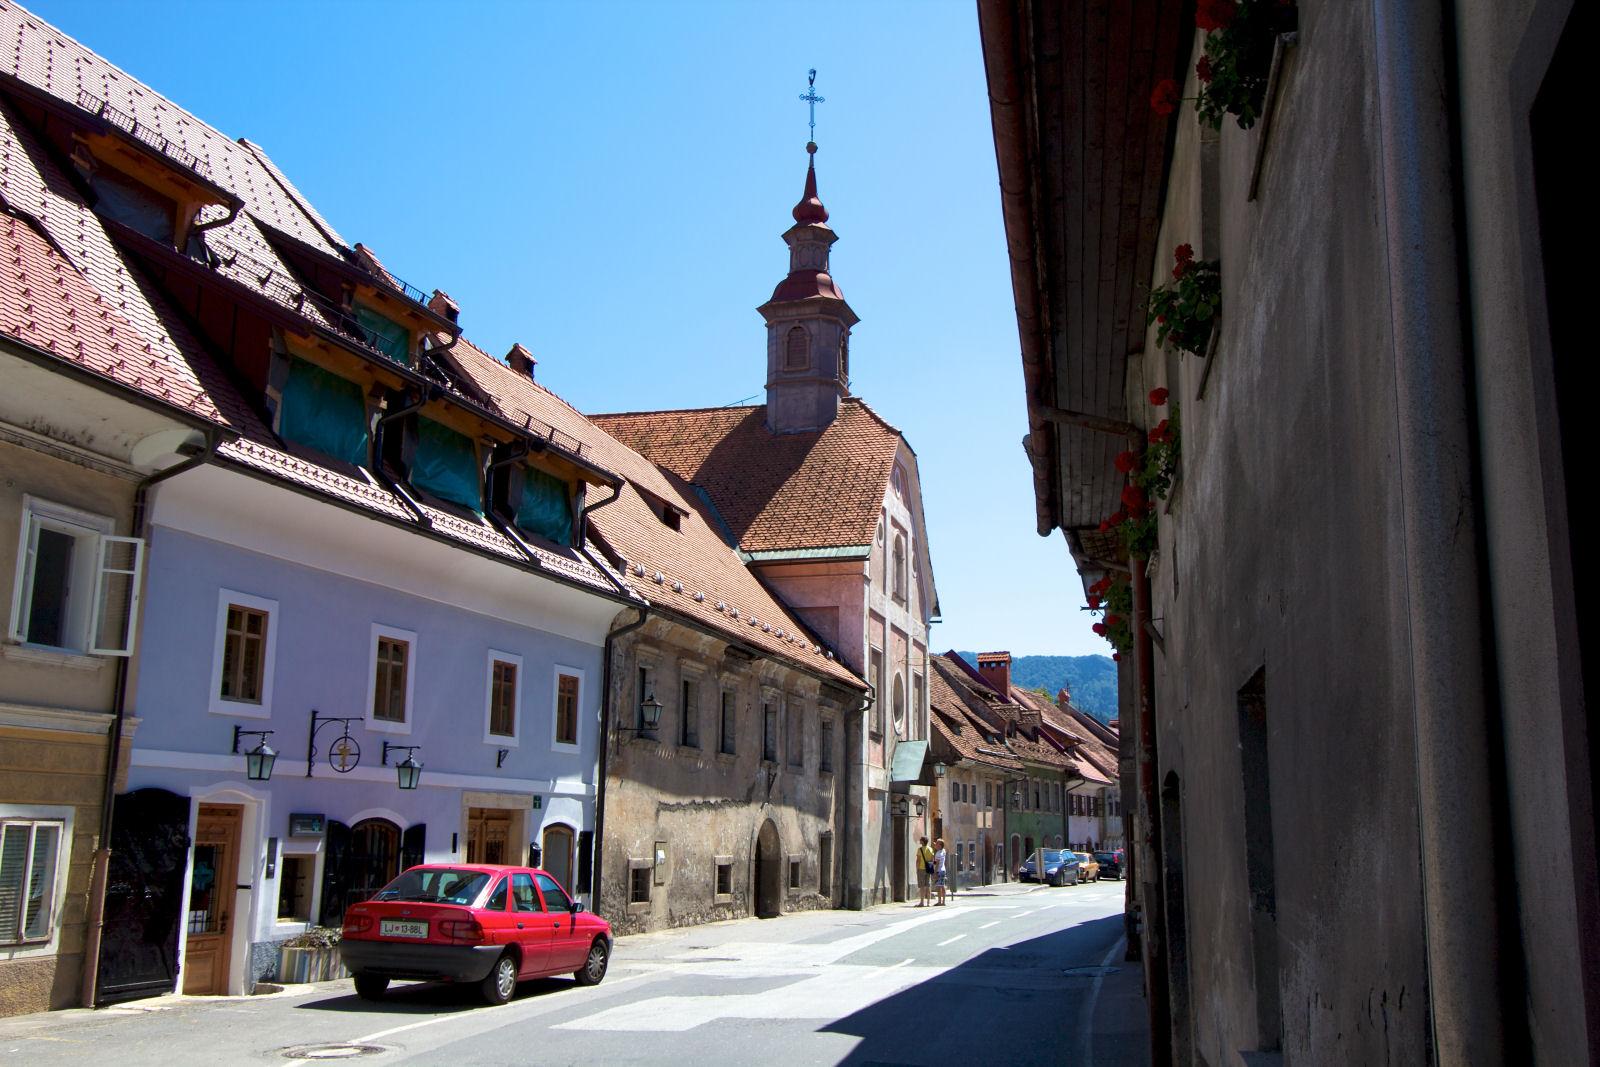 Skofja Loka street view, Gorenjska, Slovenia